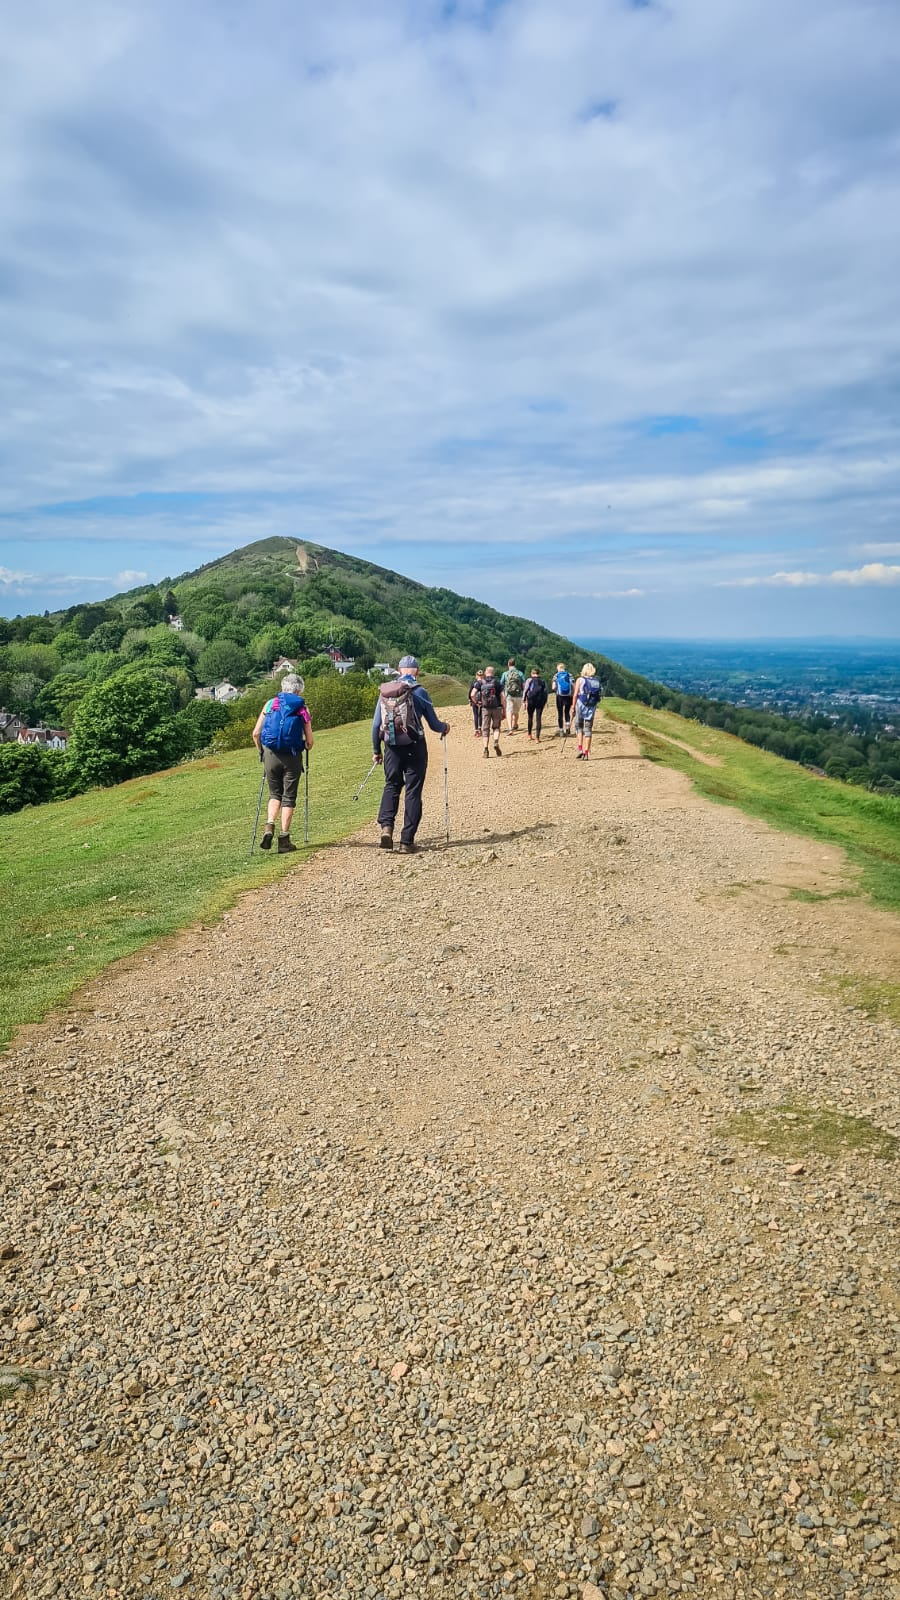 Walking the Malvern Hills as part of the Malvern Hills Walking Festival